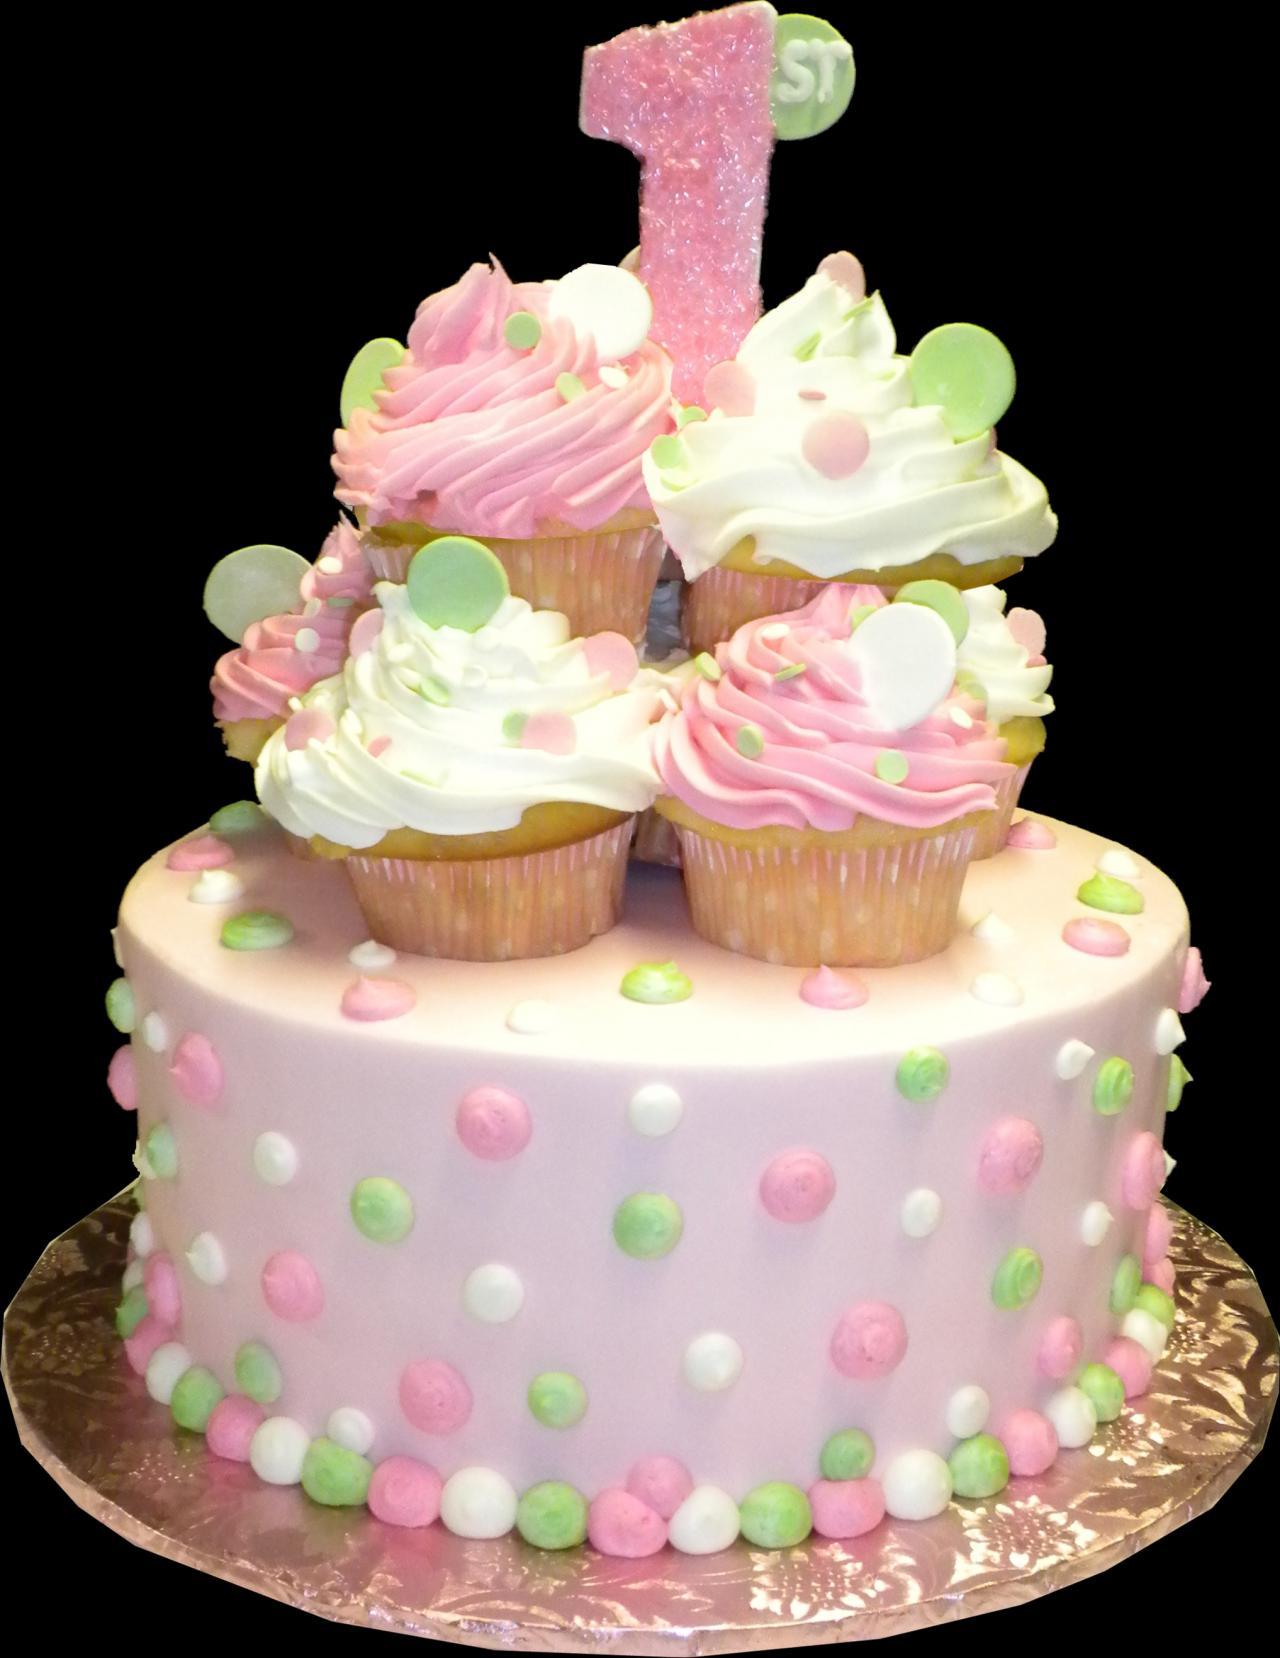 Pink and White Polka Dots Birthday Cake